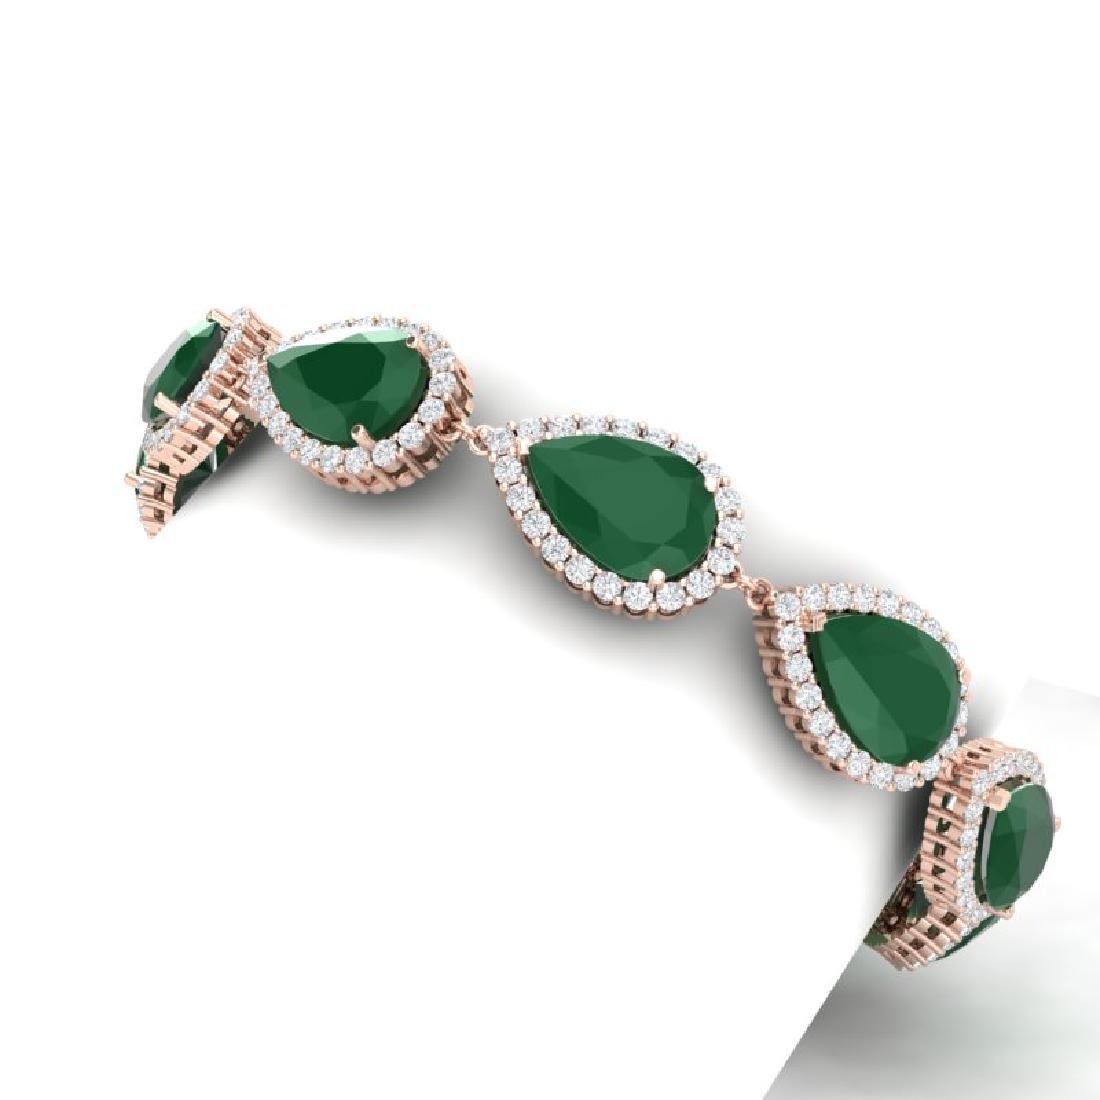 42 CTW Royalty Emerald & VS Diamond Bracelet 18K Rose - 2